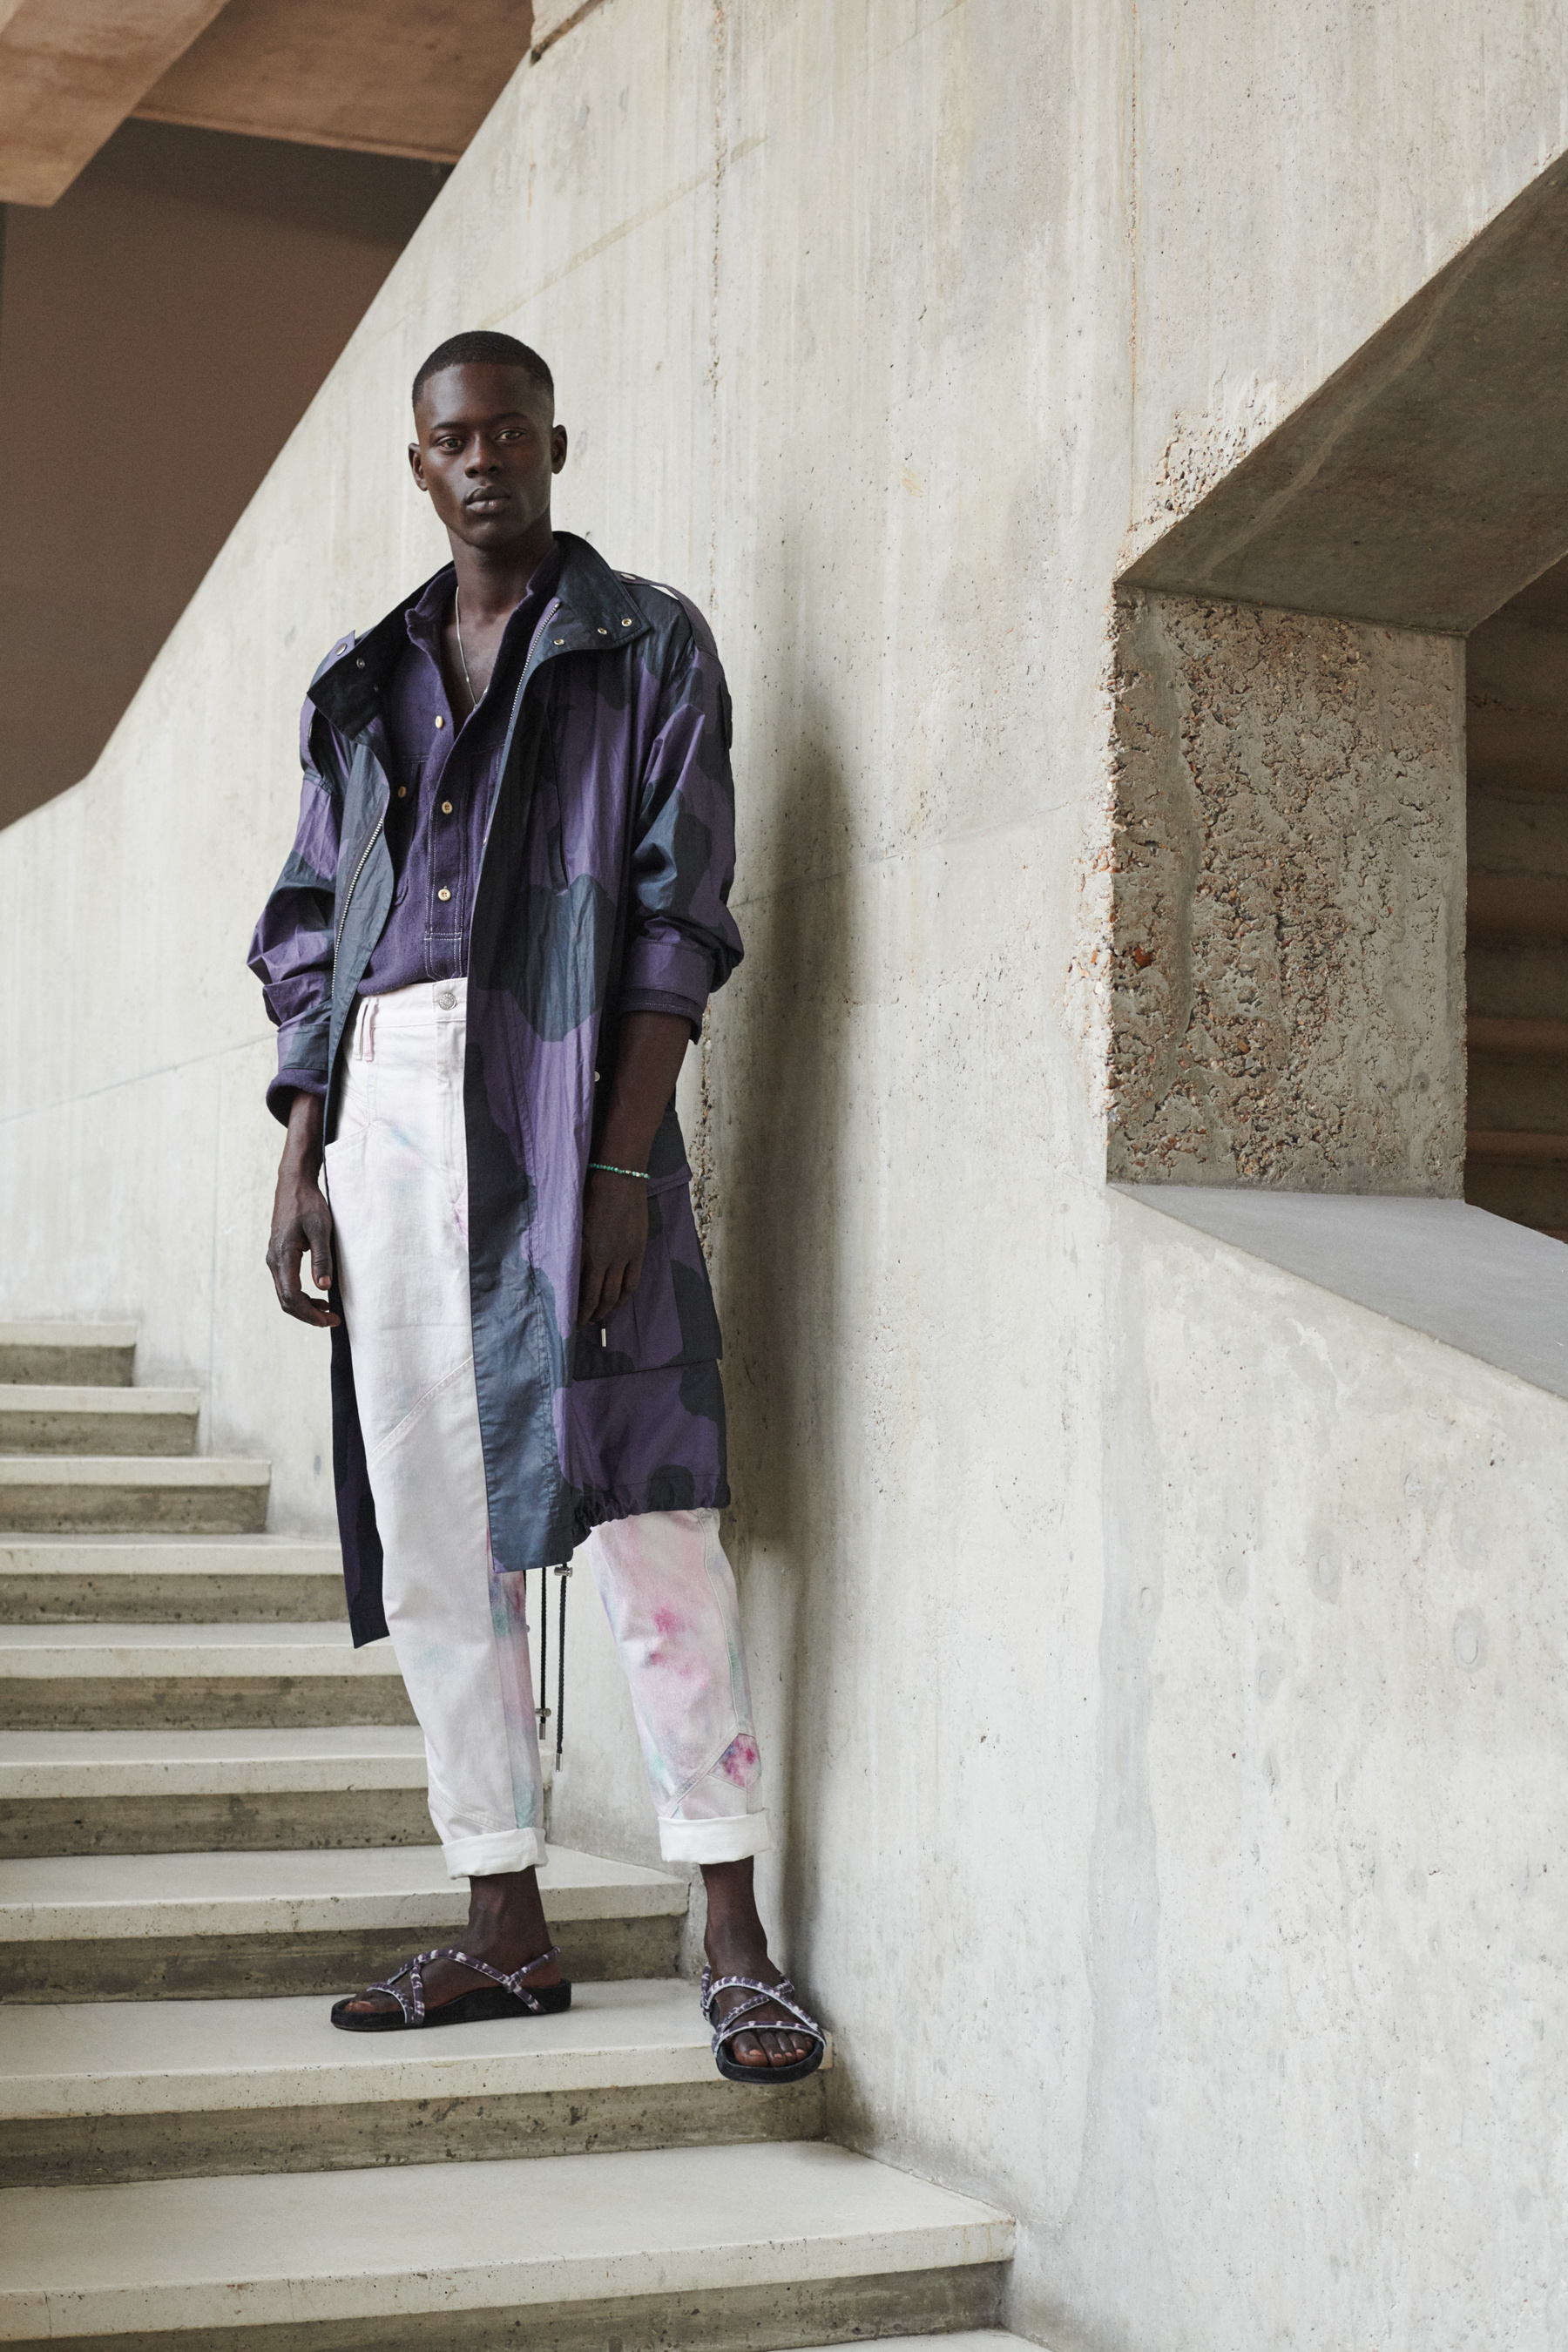 Isabel Marant Homme Spring 2021 Men's Fashion Show Photos